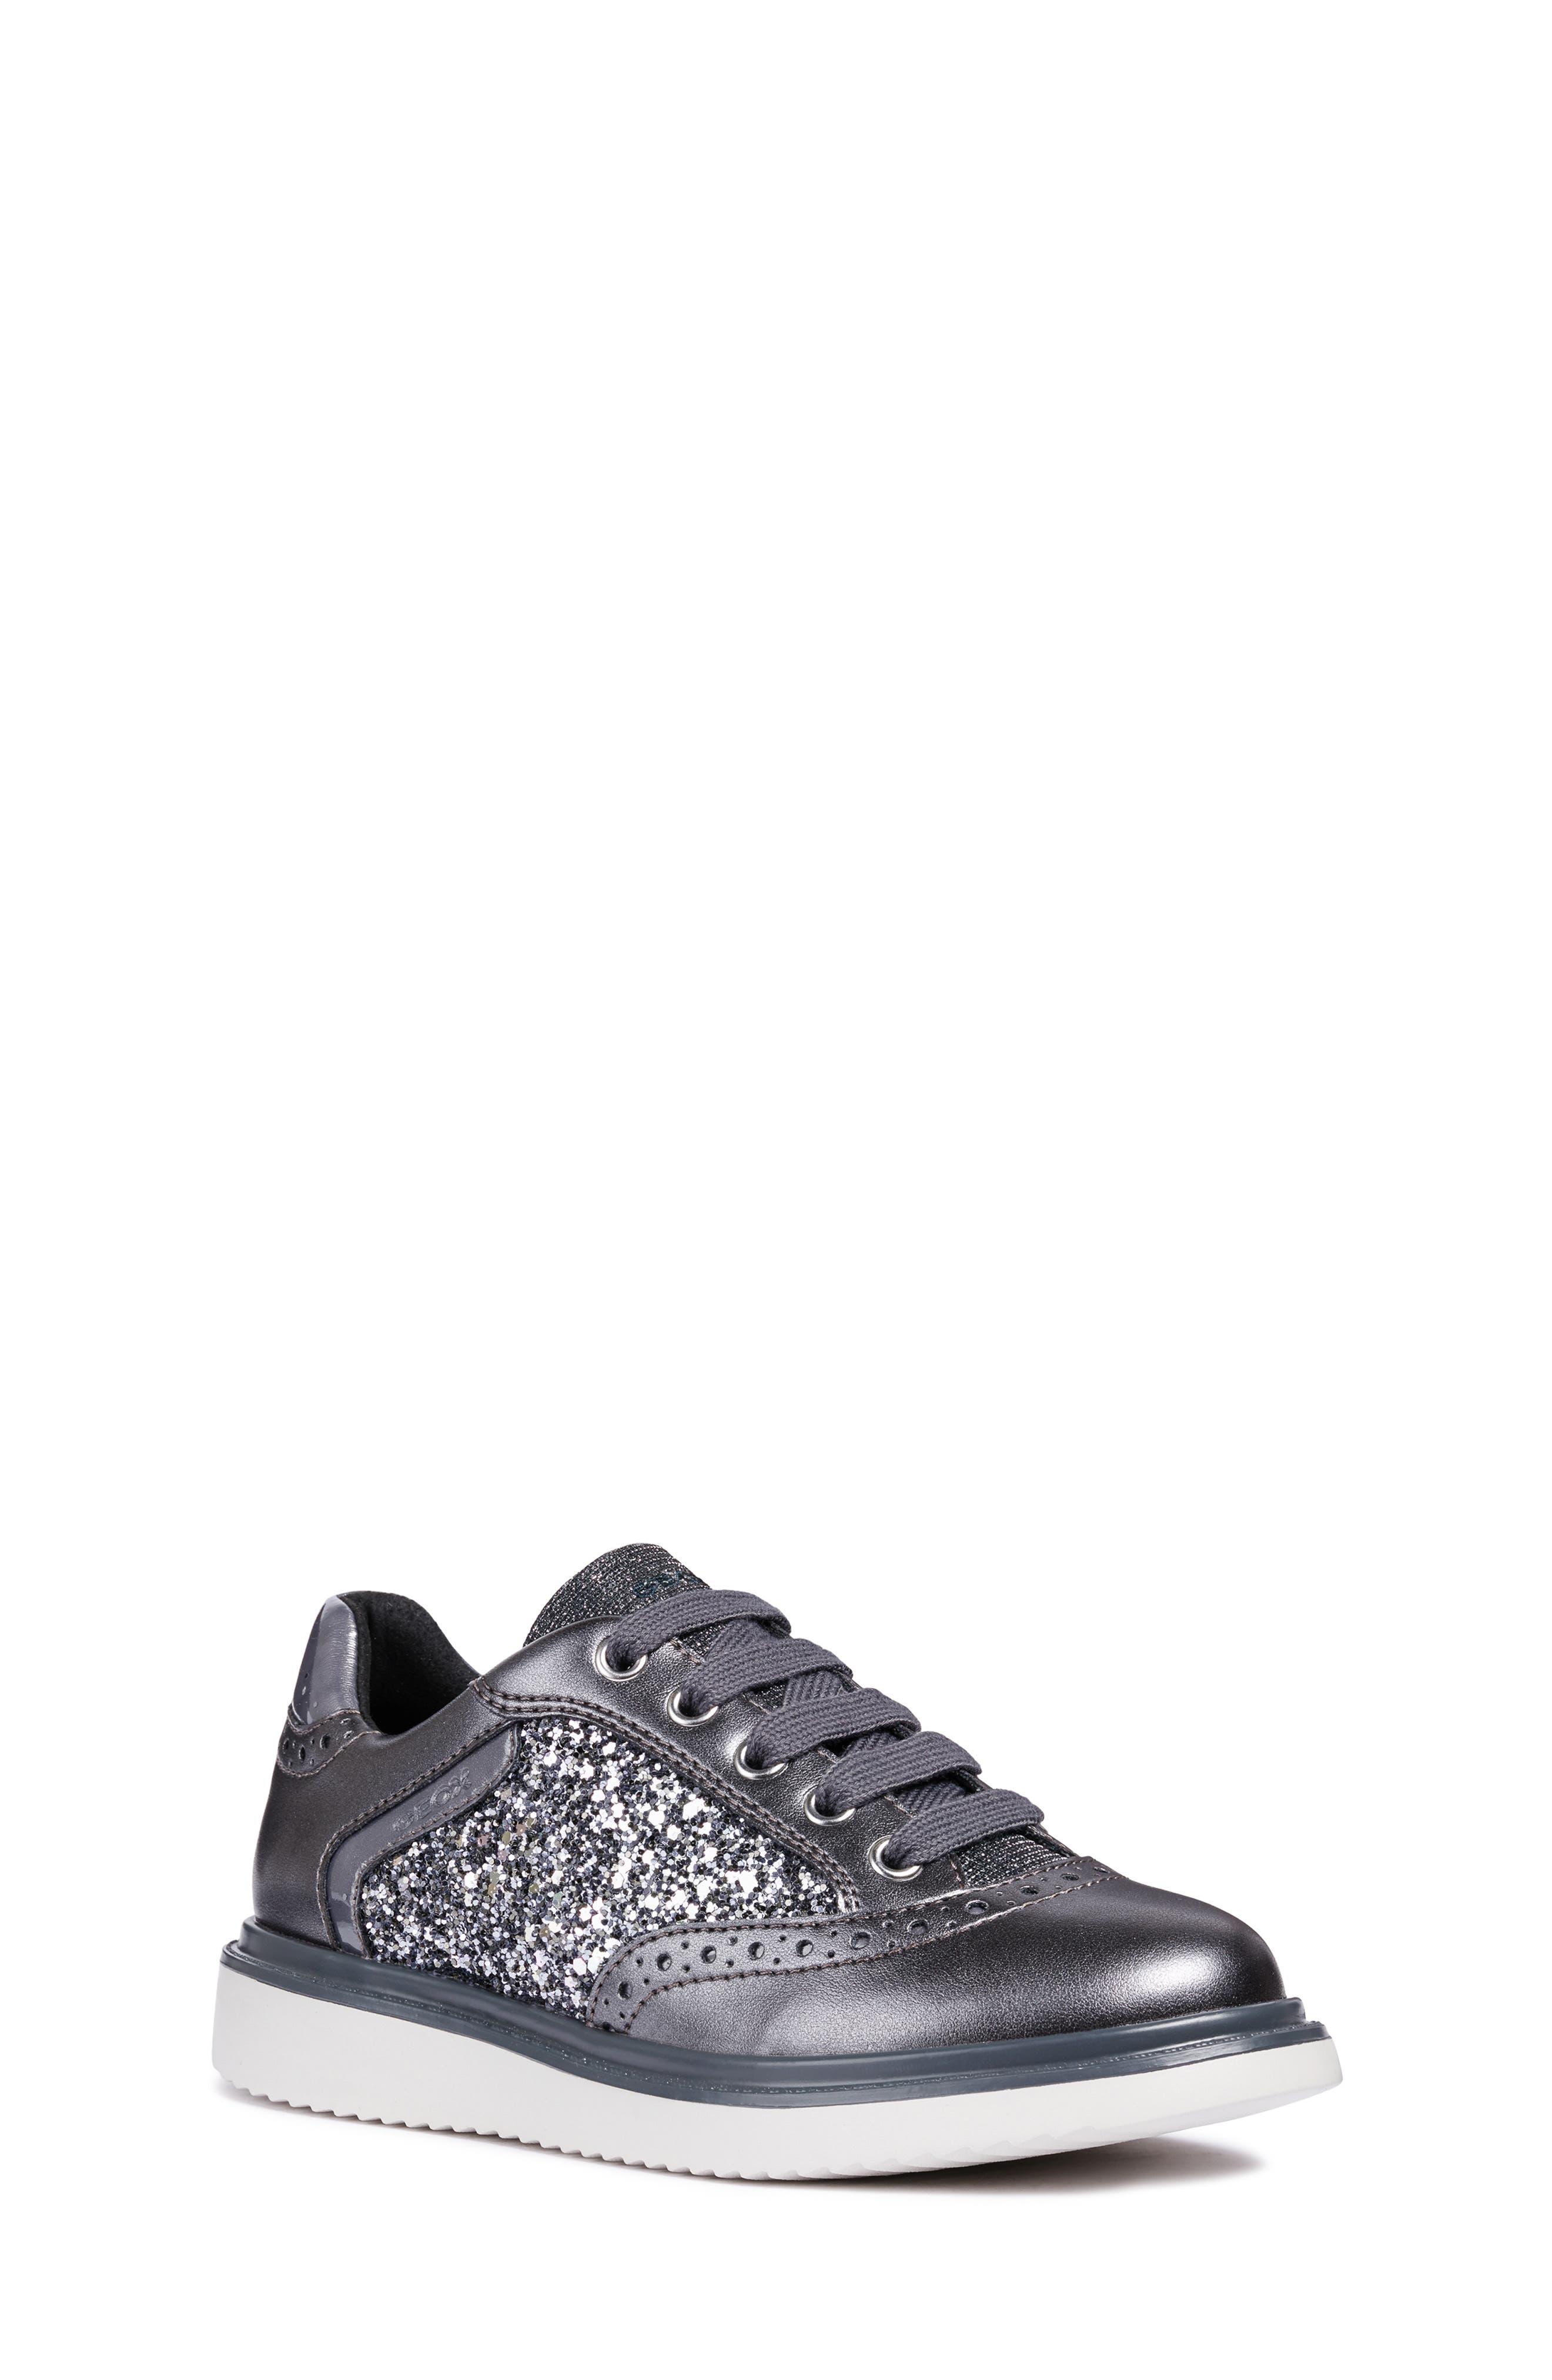 Thymar Sparkle Sneaker,                         Main,                         color, DARK SILVER